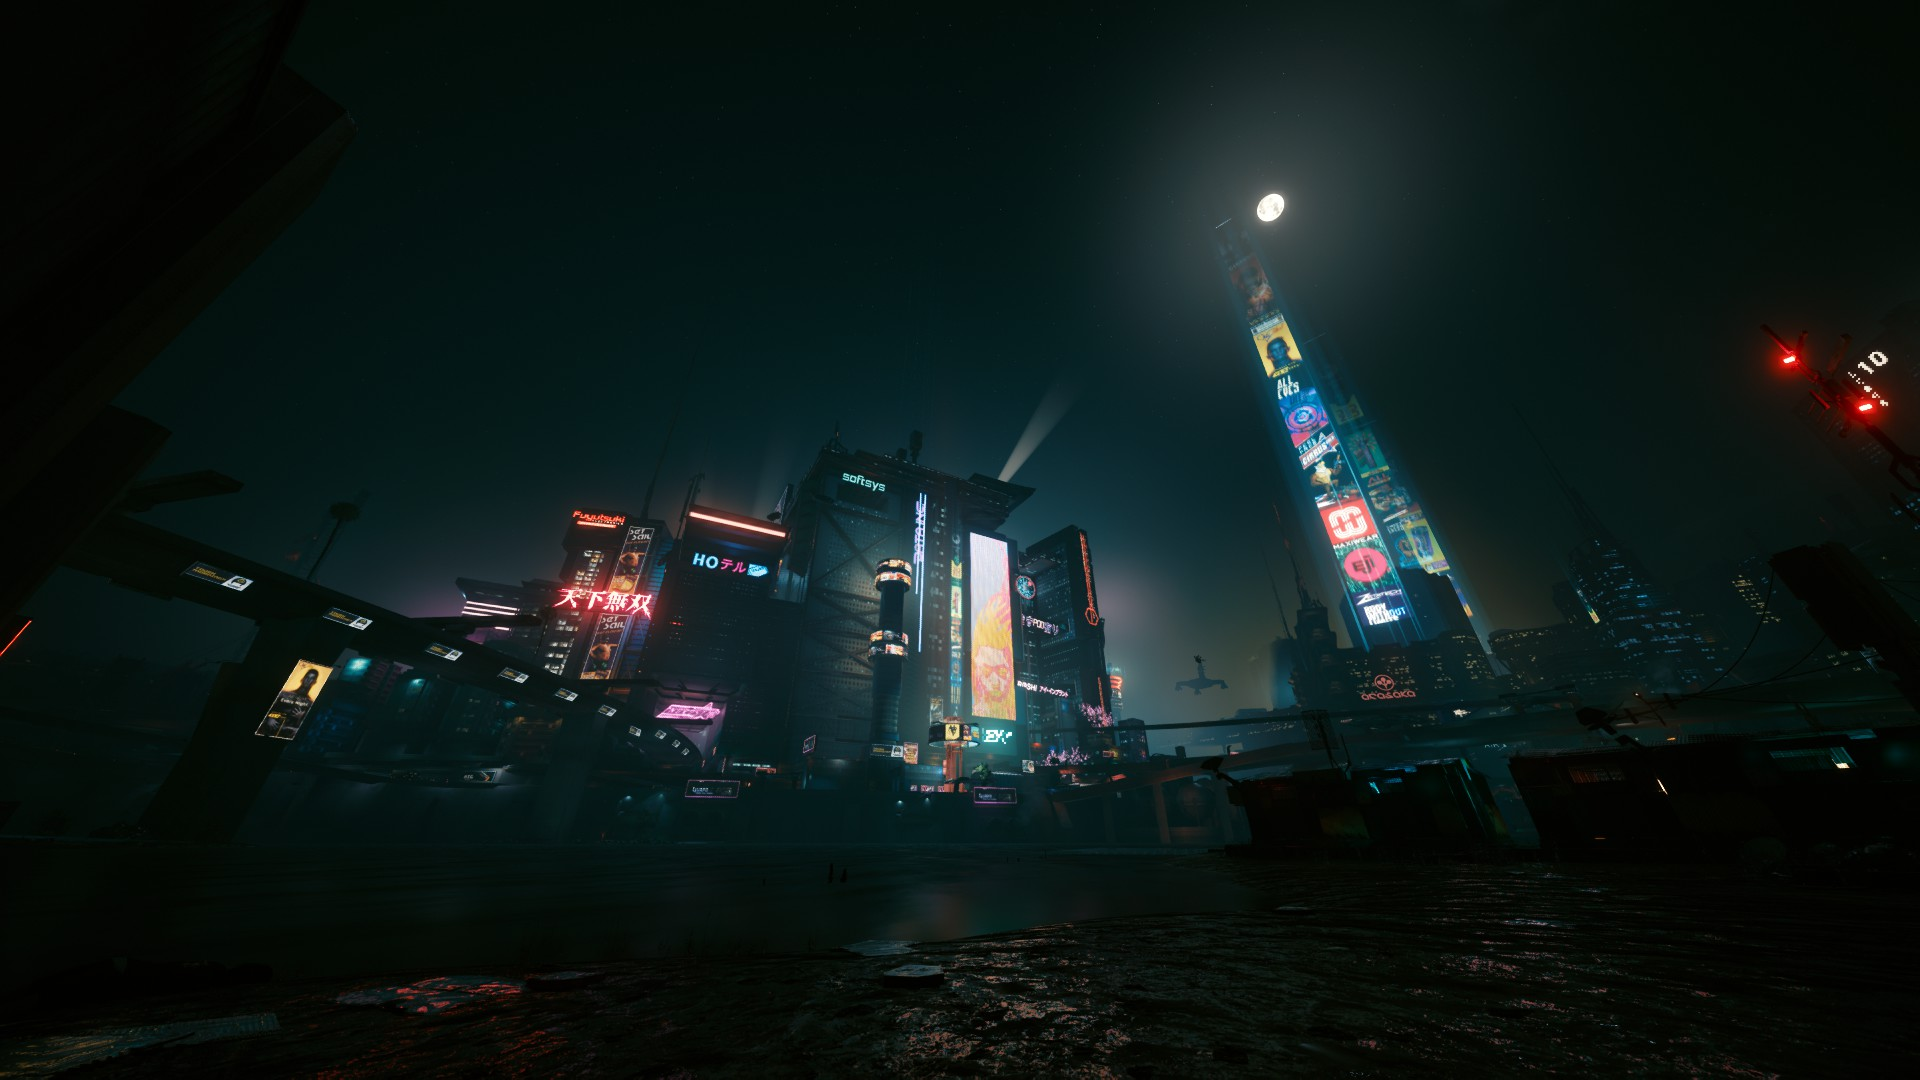 General 1920x1080 Cyberpunk 2077 night video games screen shot cyberpunk city